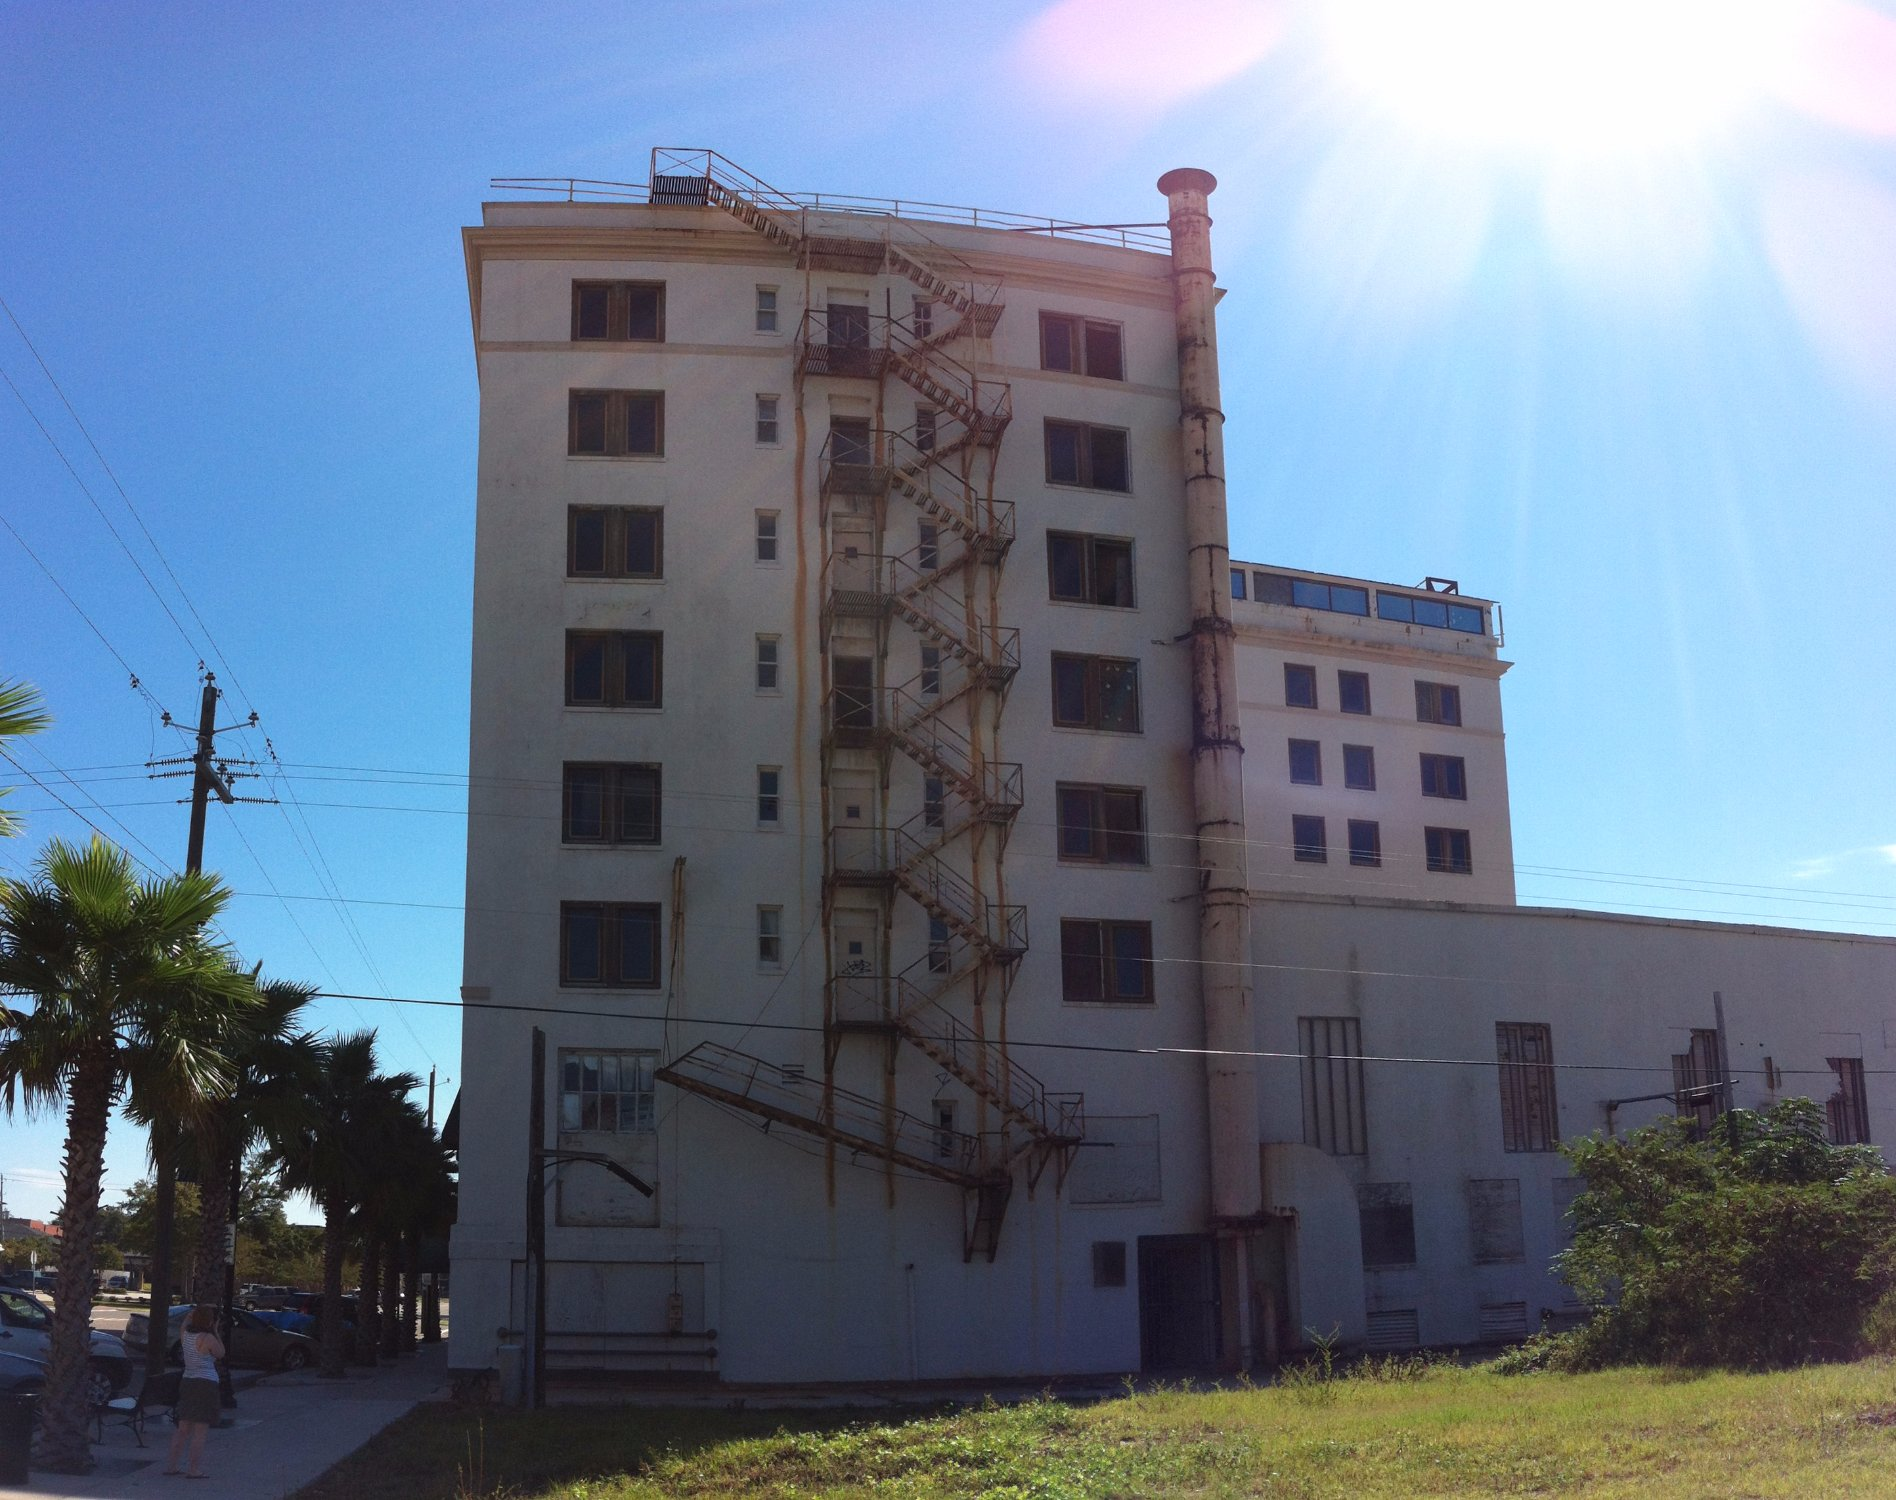 Historic Markham Hotel, Gulfport, MS